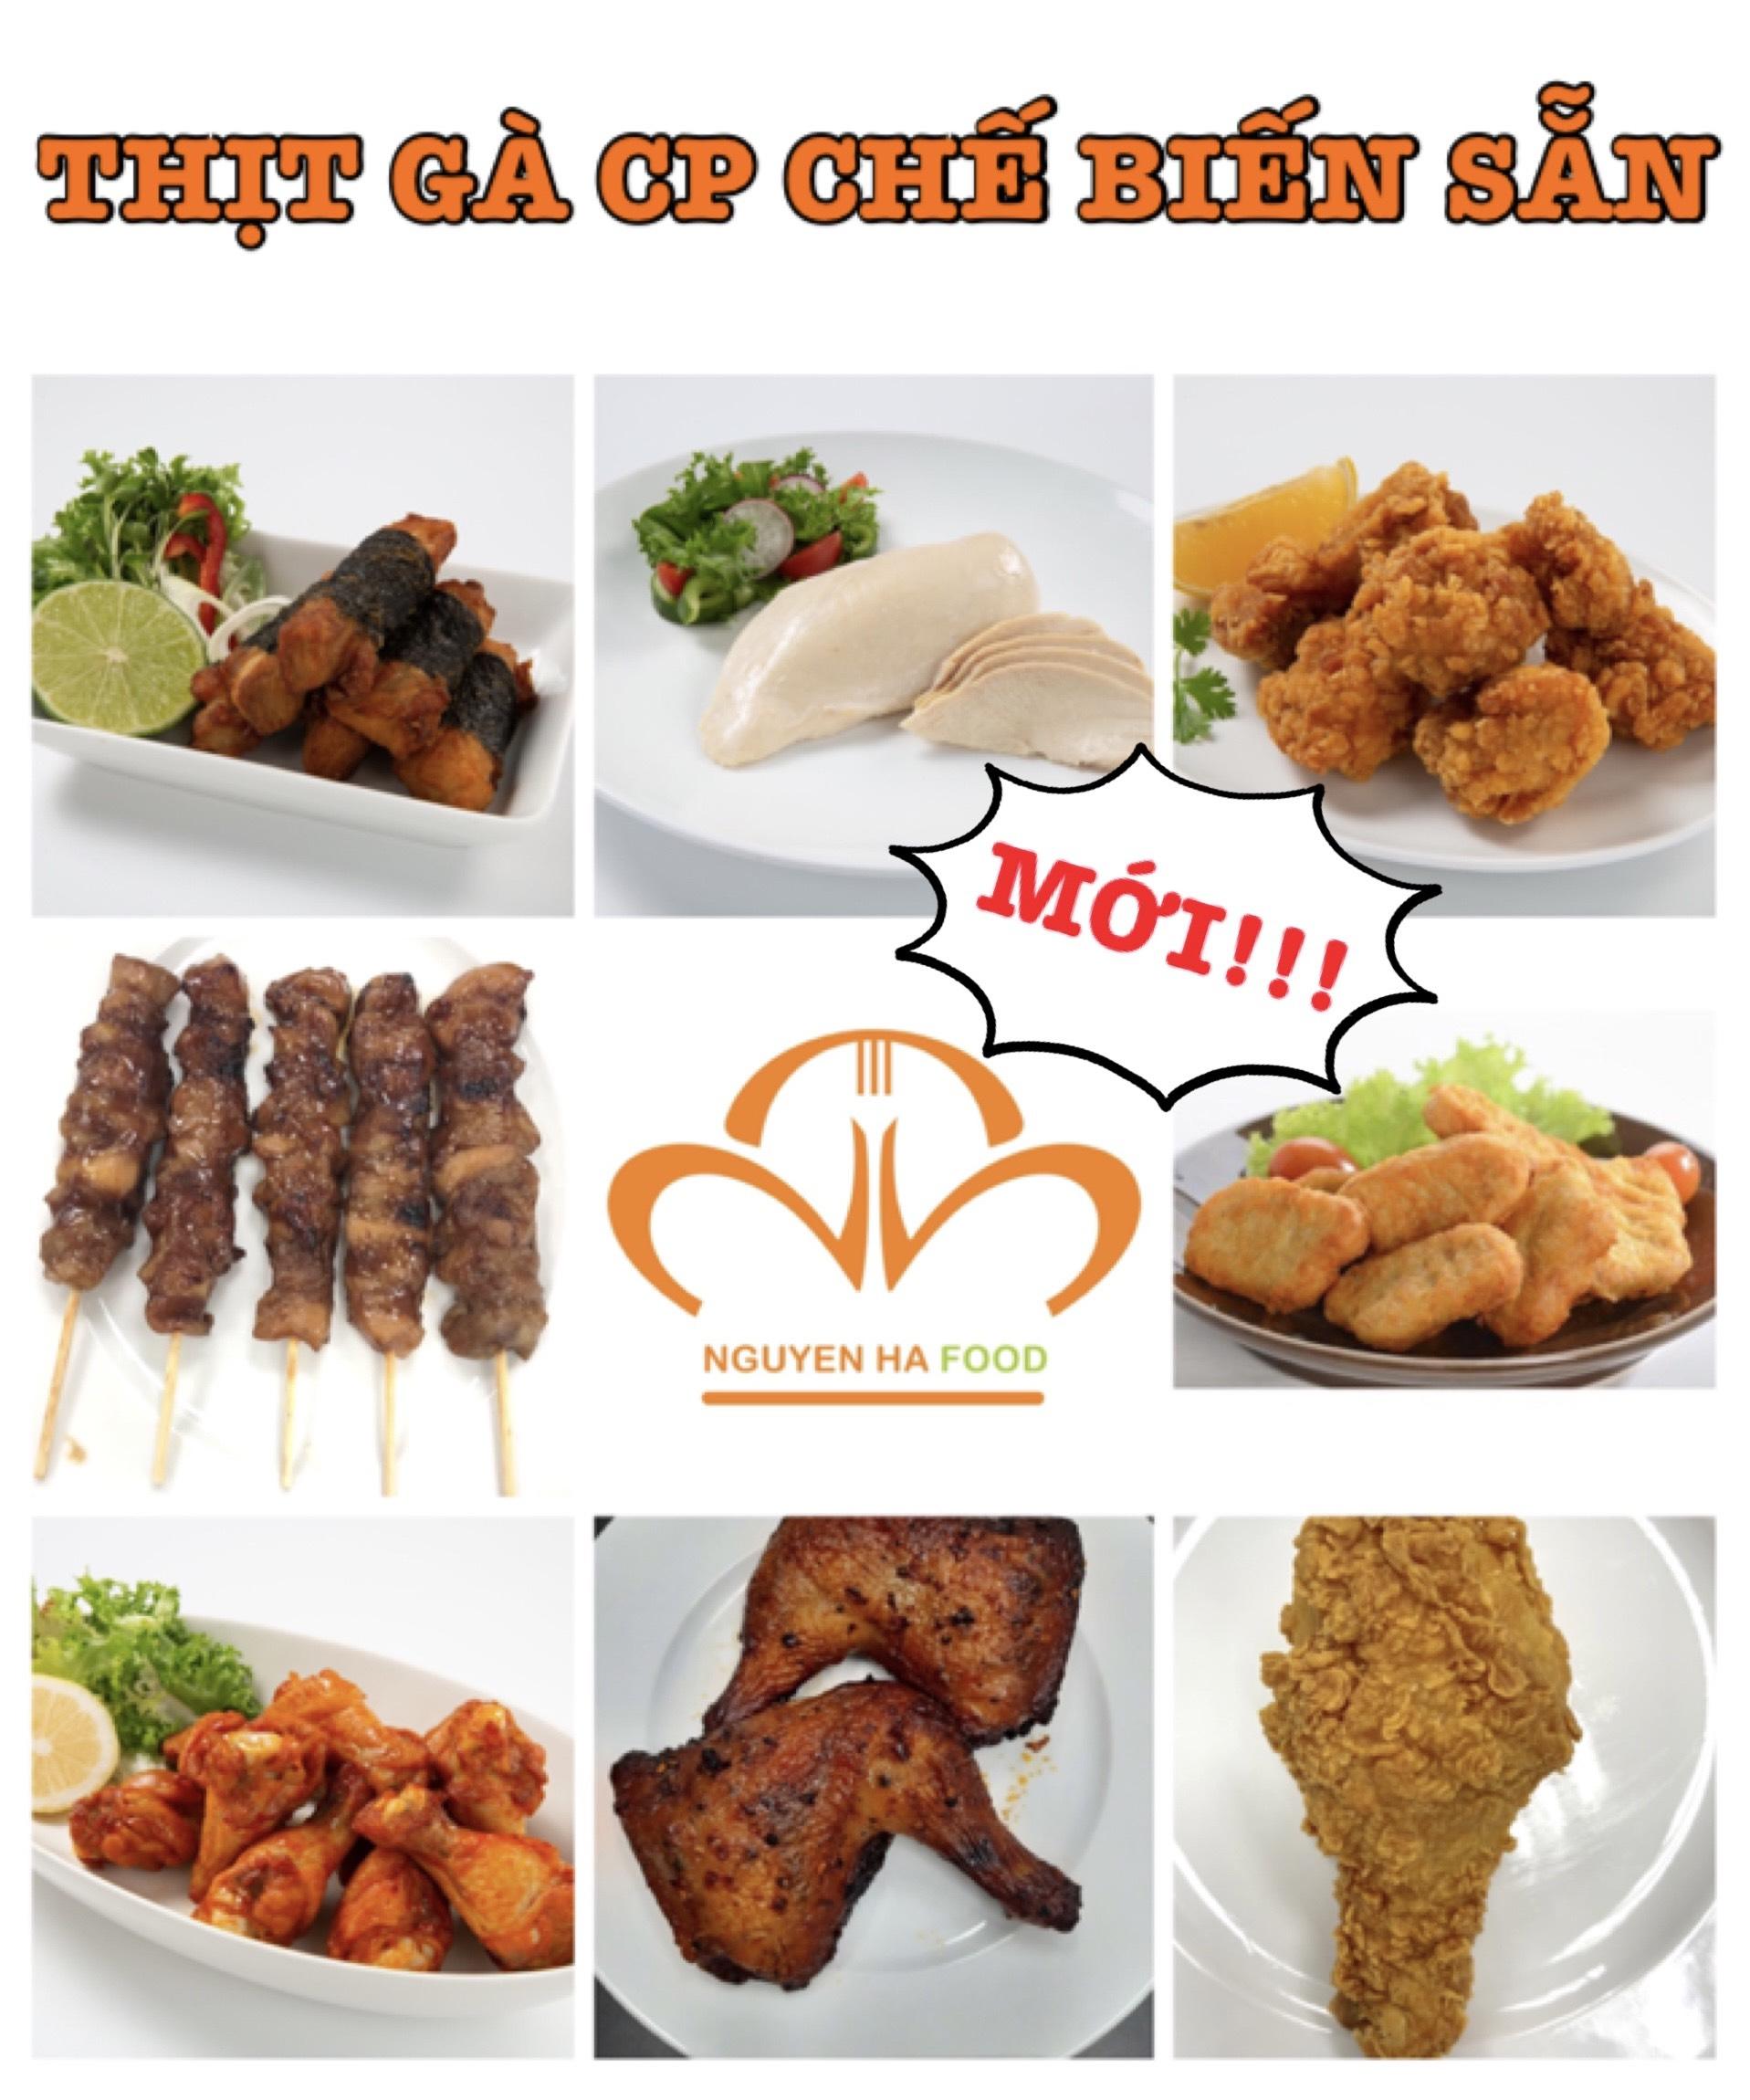 thit-ga-cp-che-bien-san-nguyen-ha-food